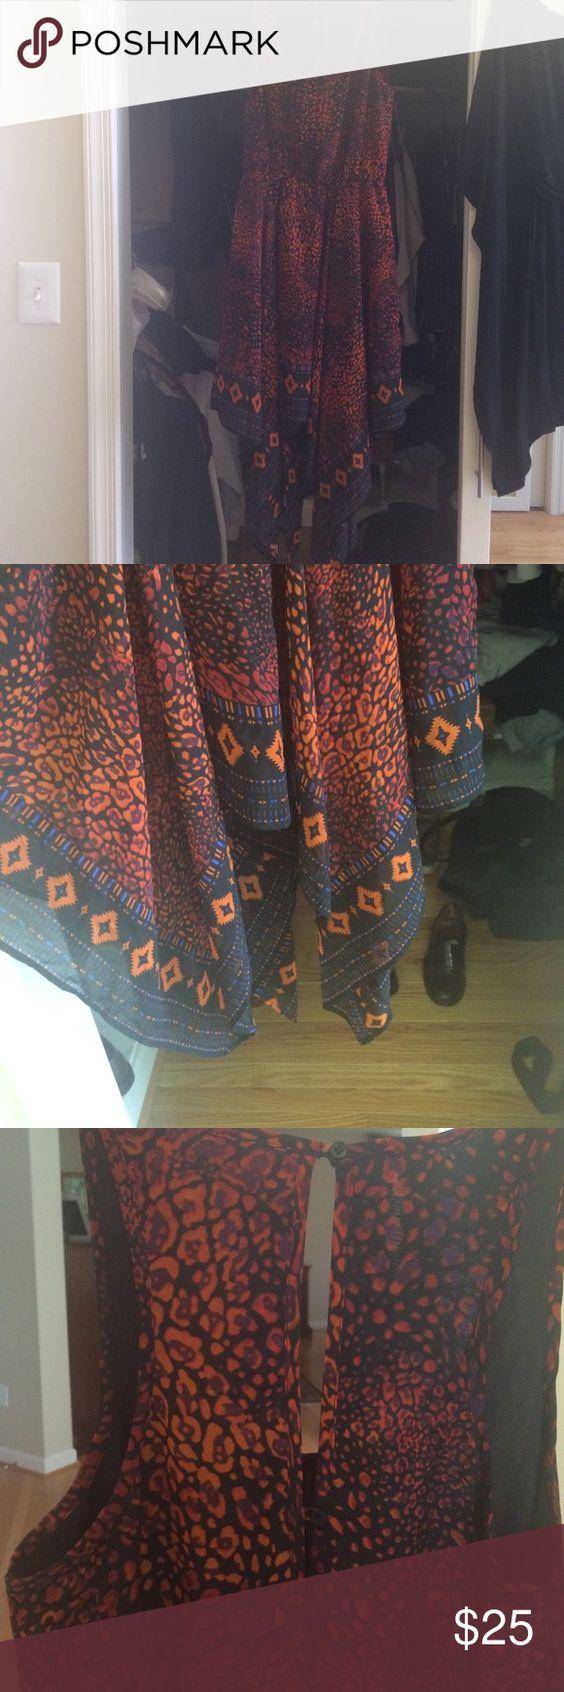 Ecote cheetah-like handkerchief dress Like-new Ecote handkerchief dress Urban Outfitters Dresses Asymmetrical